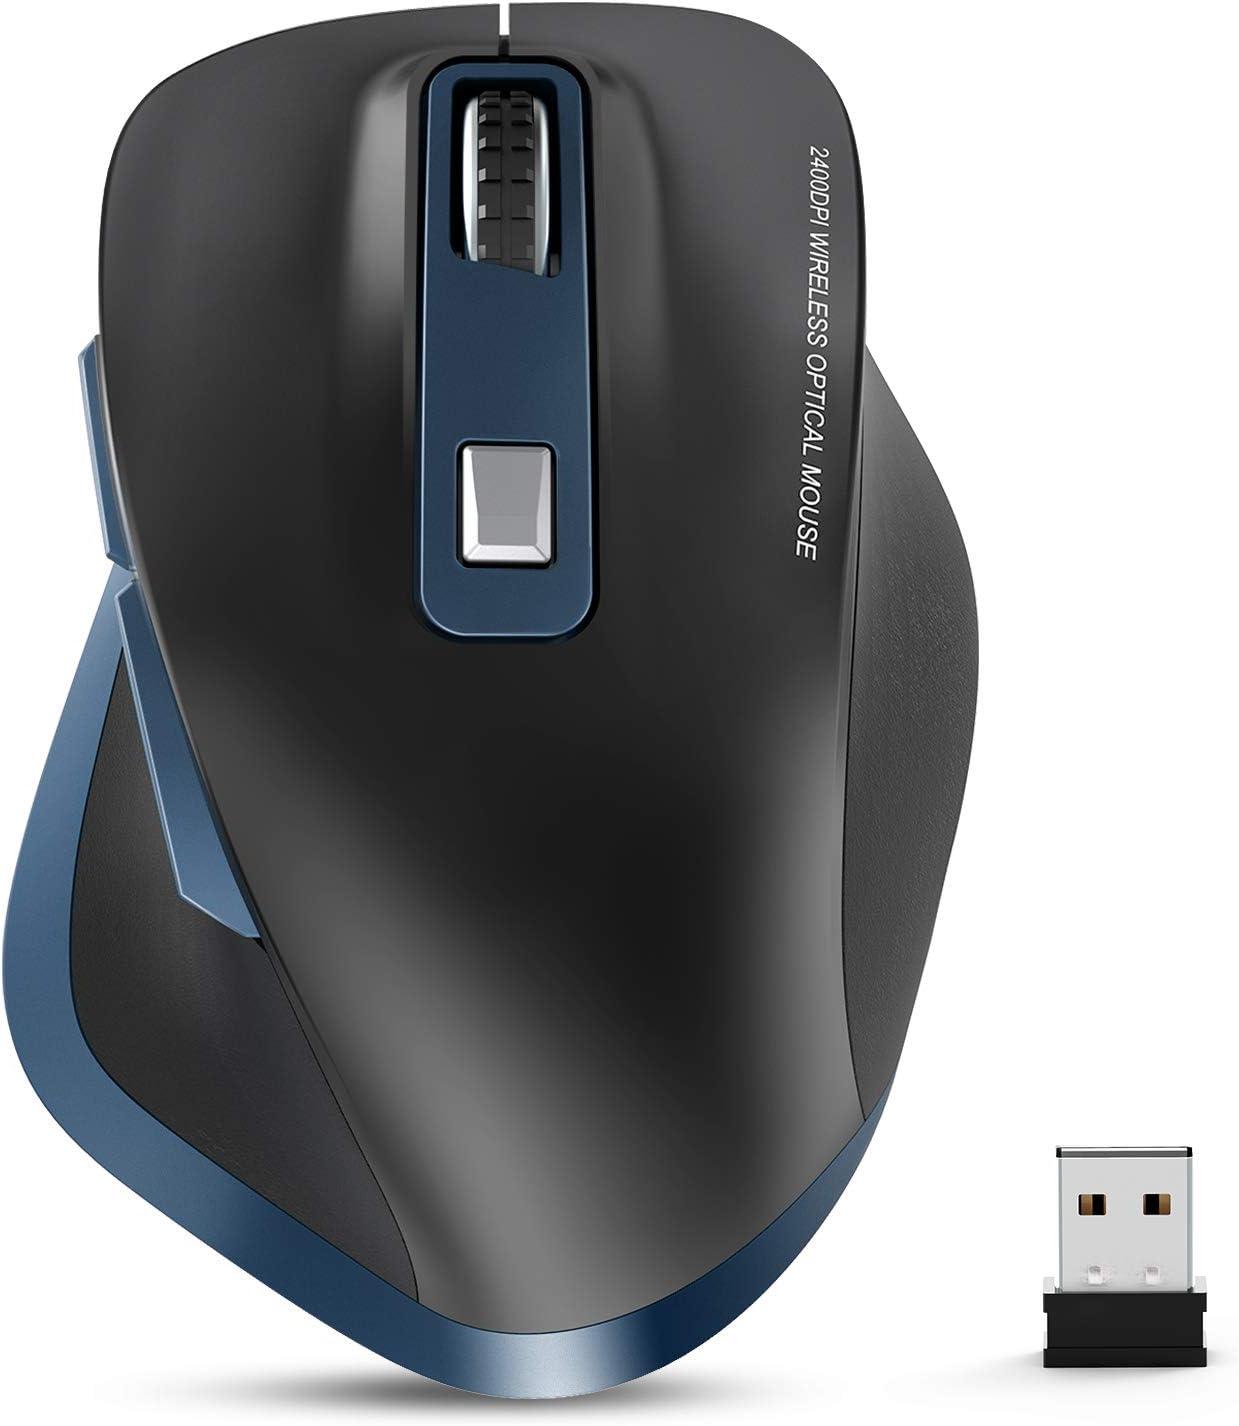 TedGem Ratón inalámbrico para portátil, 2,4 G, ratón inalámbrico 2400 PPP, Receptor USB Nano, 6 Botones, para PC/Tablet/portátil y Windows/Mac/Linux, Office Home (Azul y Negro)